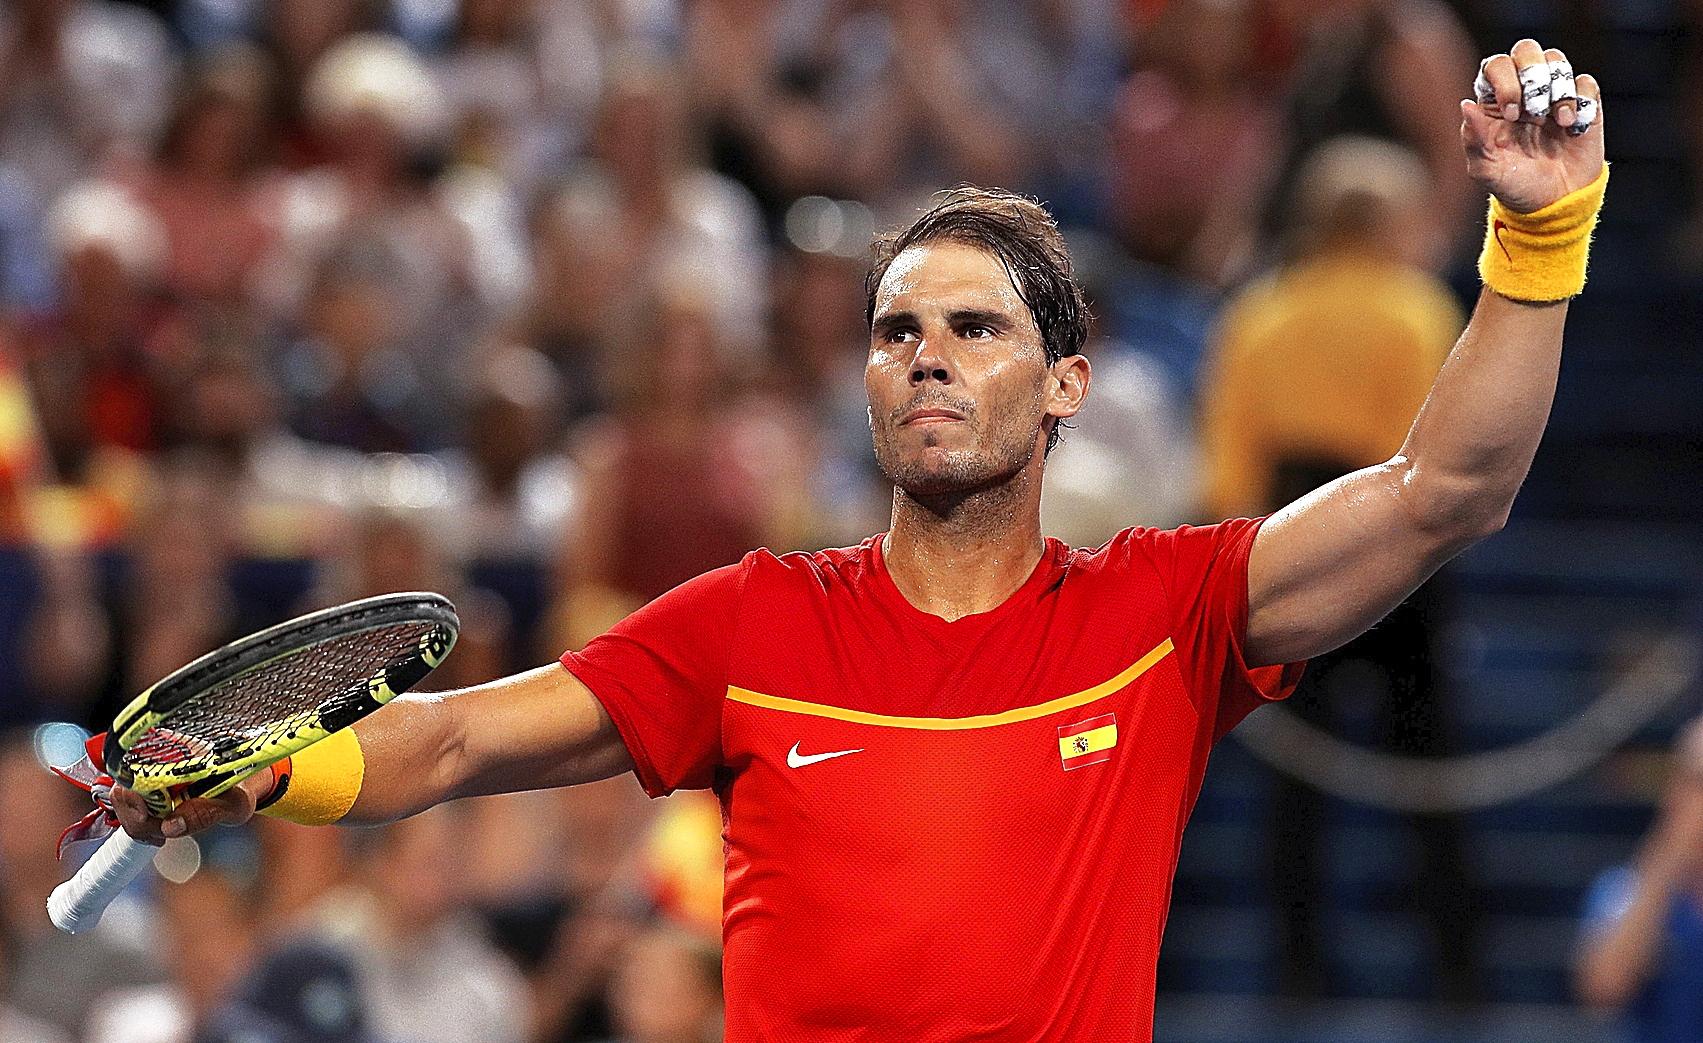 Rafa Nadal celebra su victoria ante Pablo Cuevas - ATP 2020